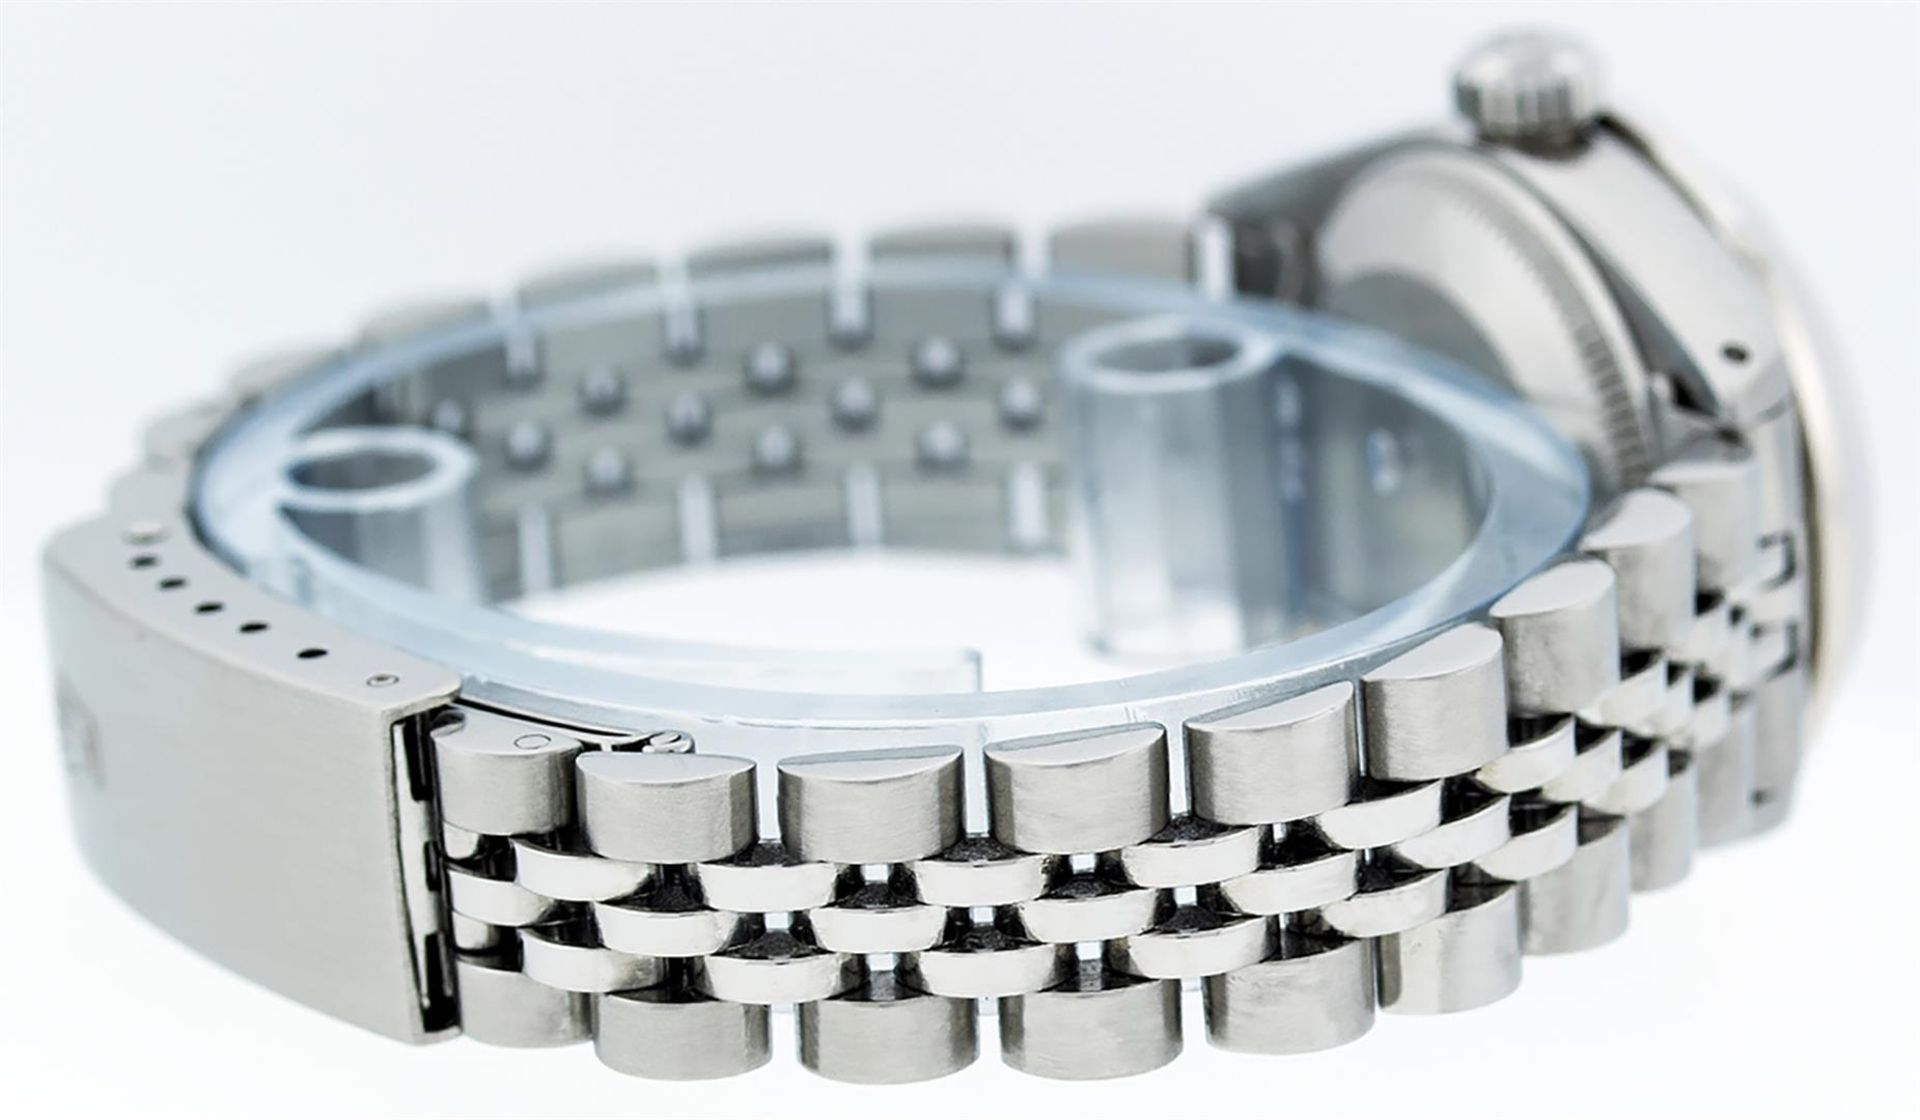 Rolex Ladies Stainless Steel MOP Diamond & Ruby 26MM Datejust Wristwatch - Image 4 of 9